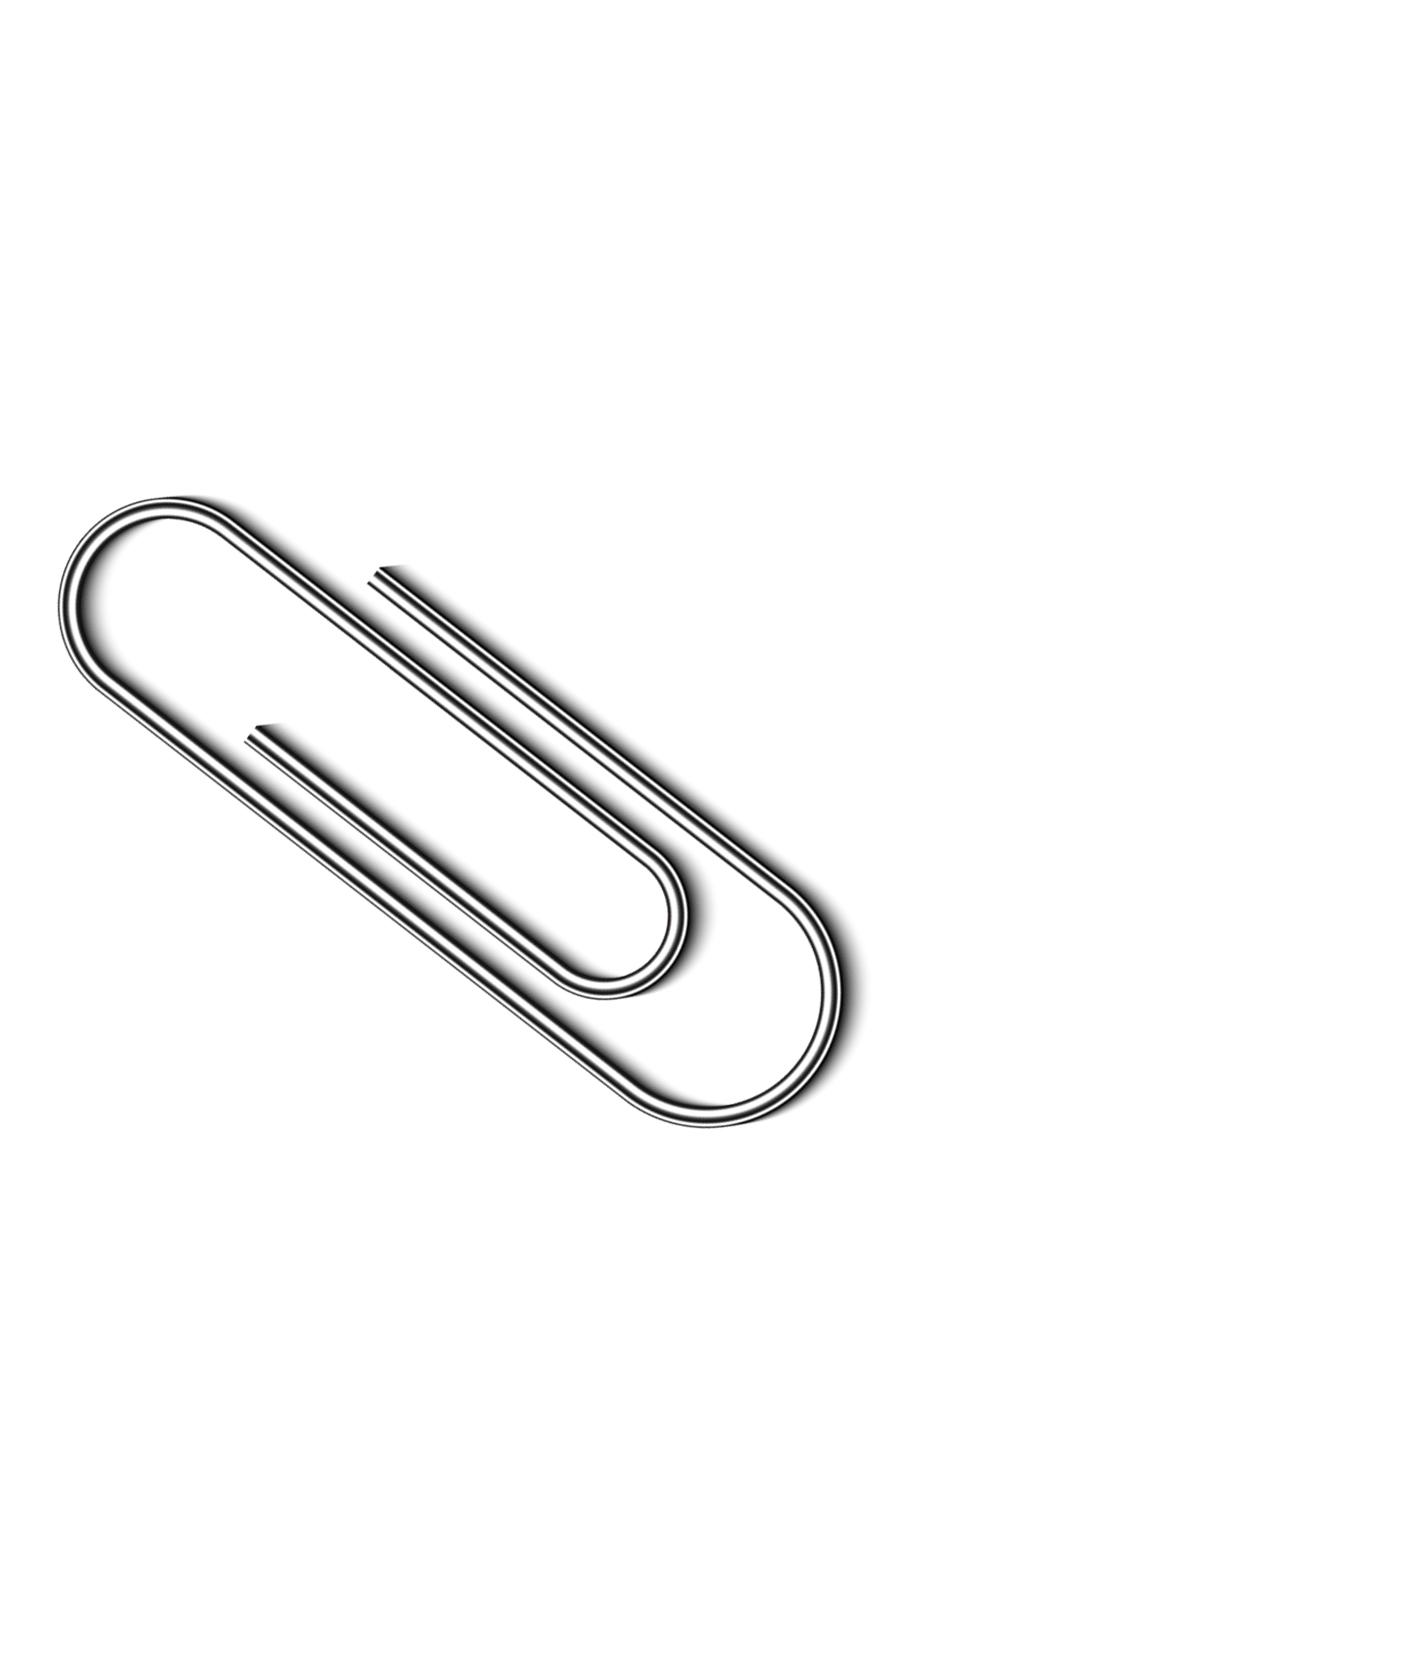 paper clip 1.jpg